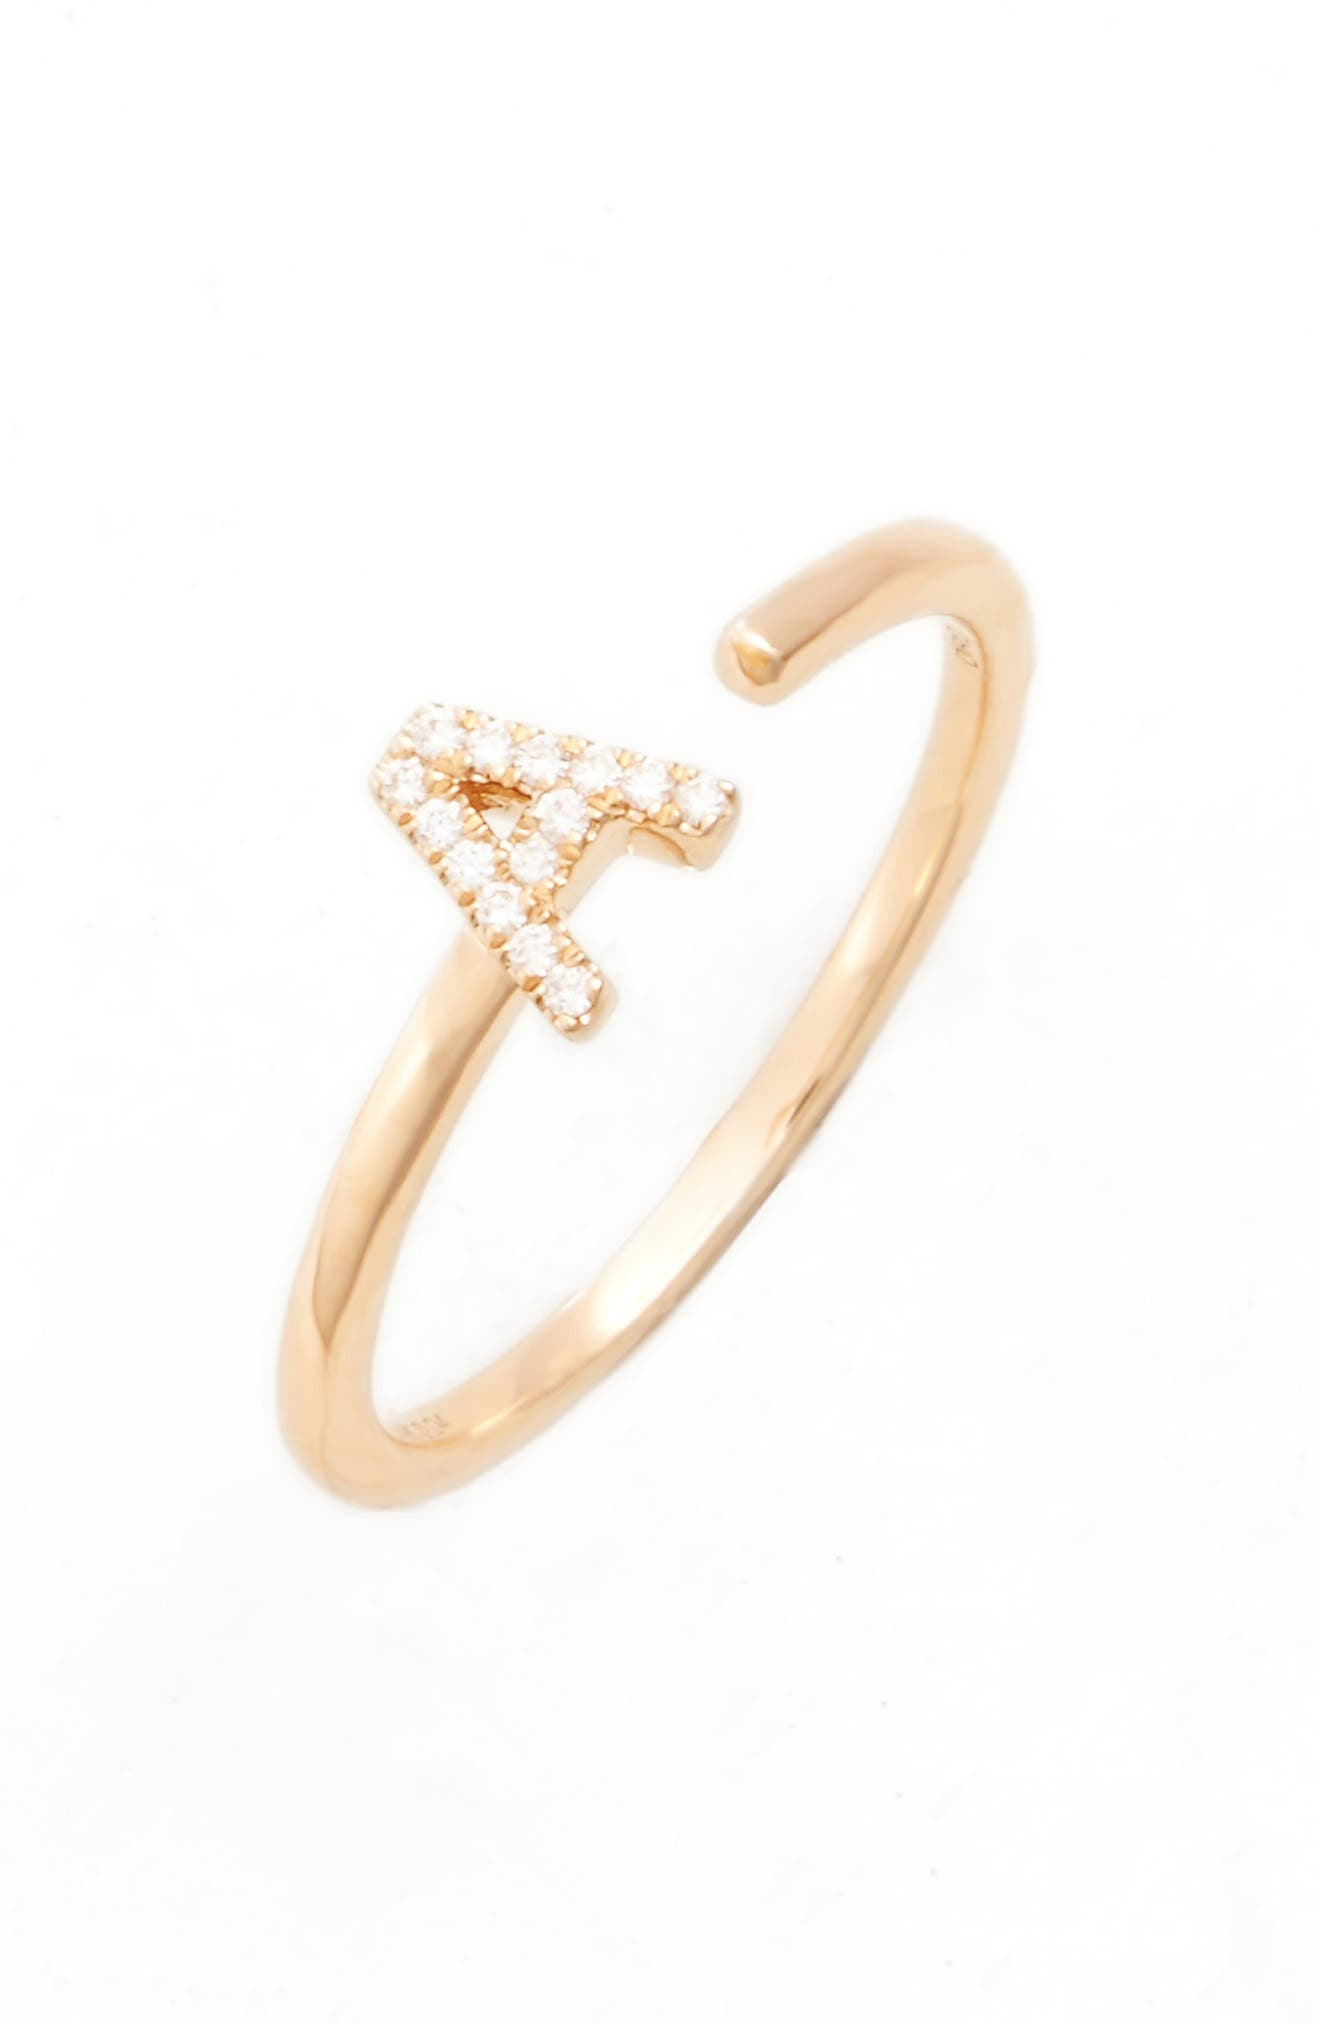 DANA REBECCA DESIGNS Single Initial Open Ring